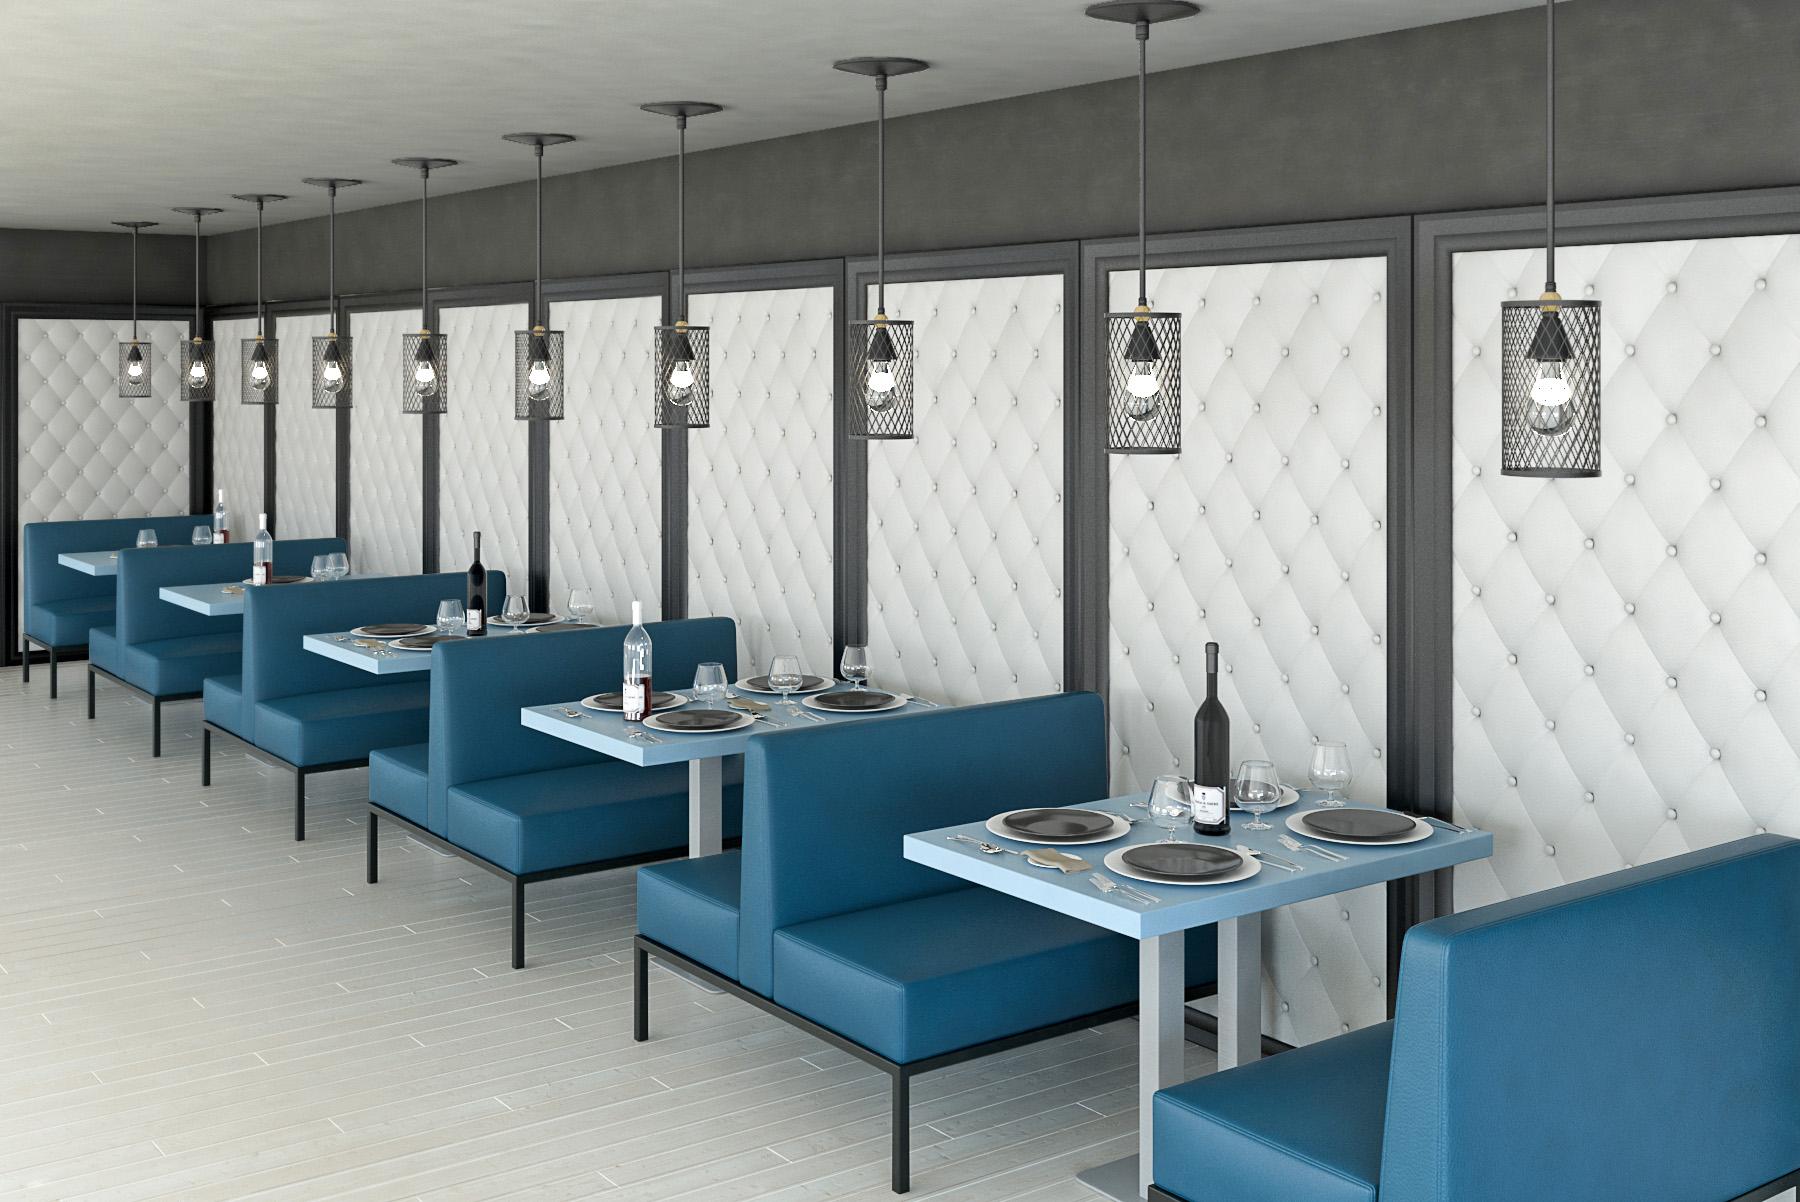 lake-classic-booth-wall-aquamarine-grey-top-formica-8821-side-view.jpg